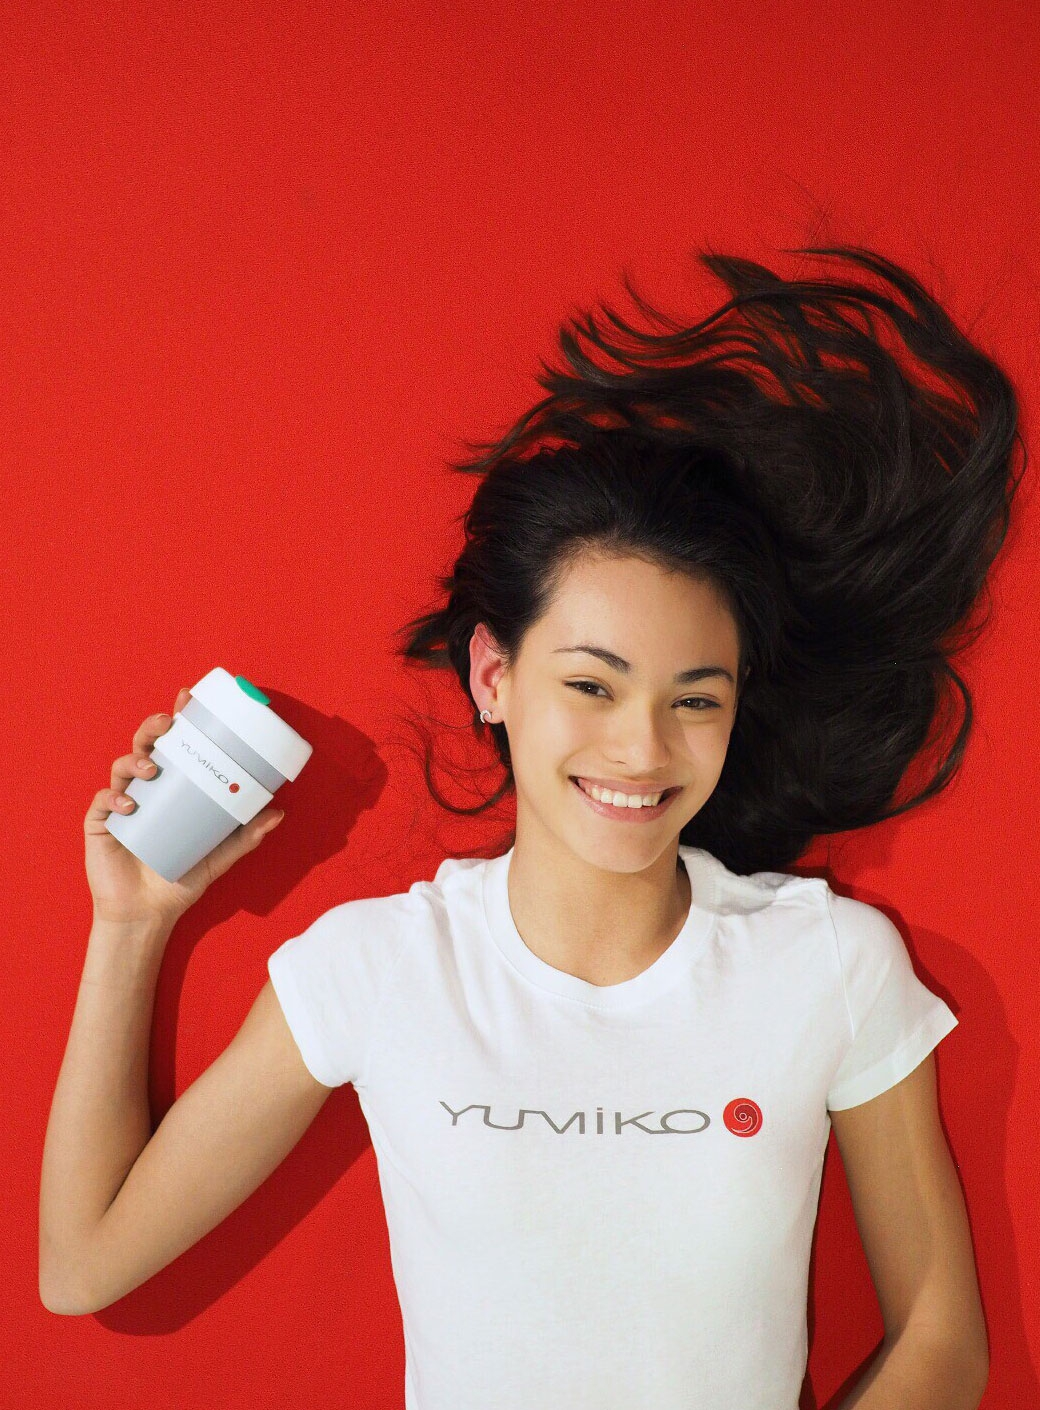 Yumiko 10% Group Discount